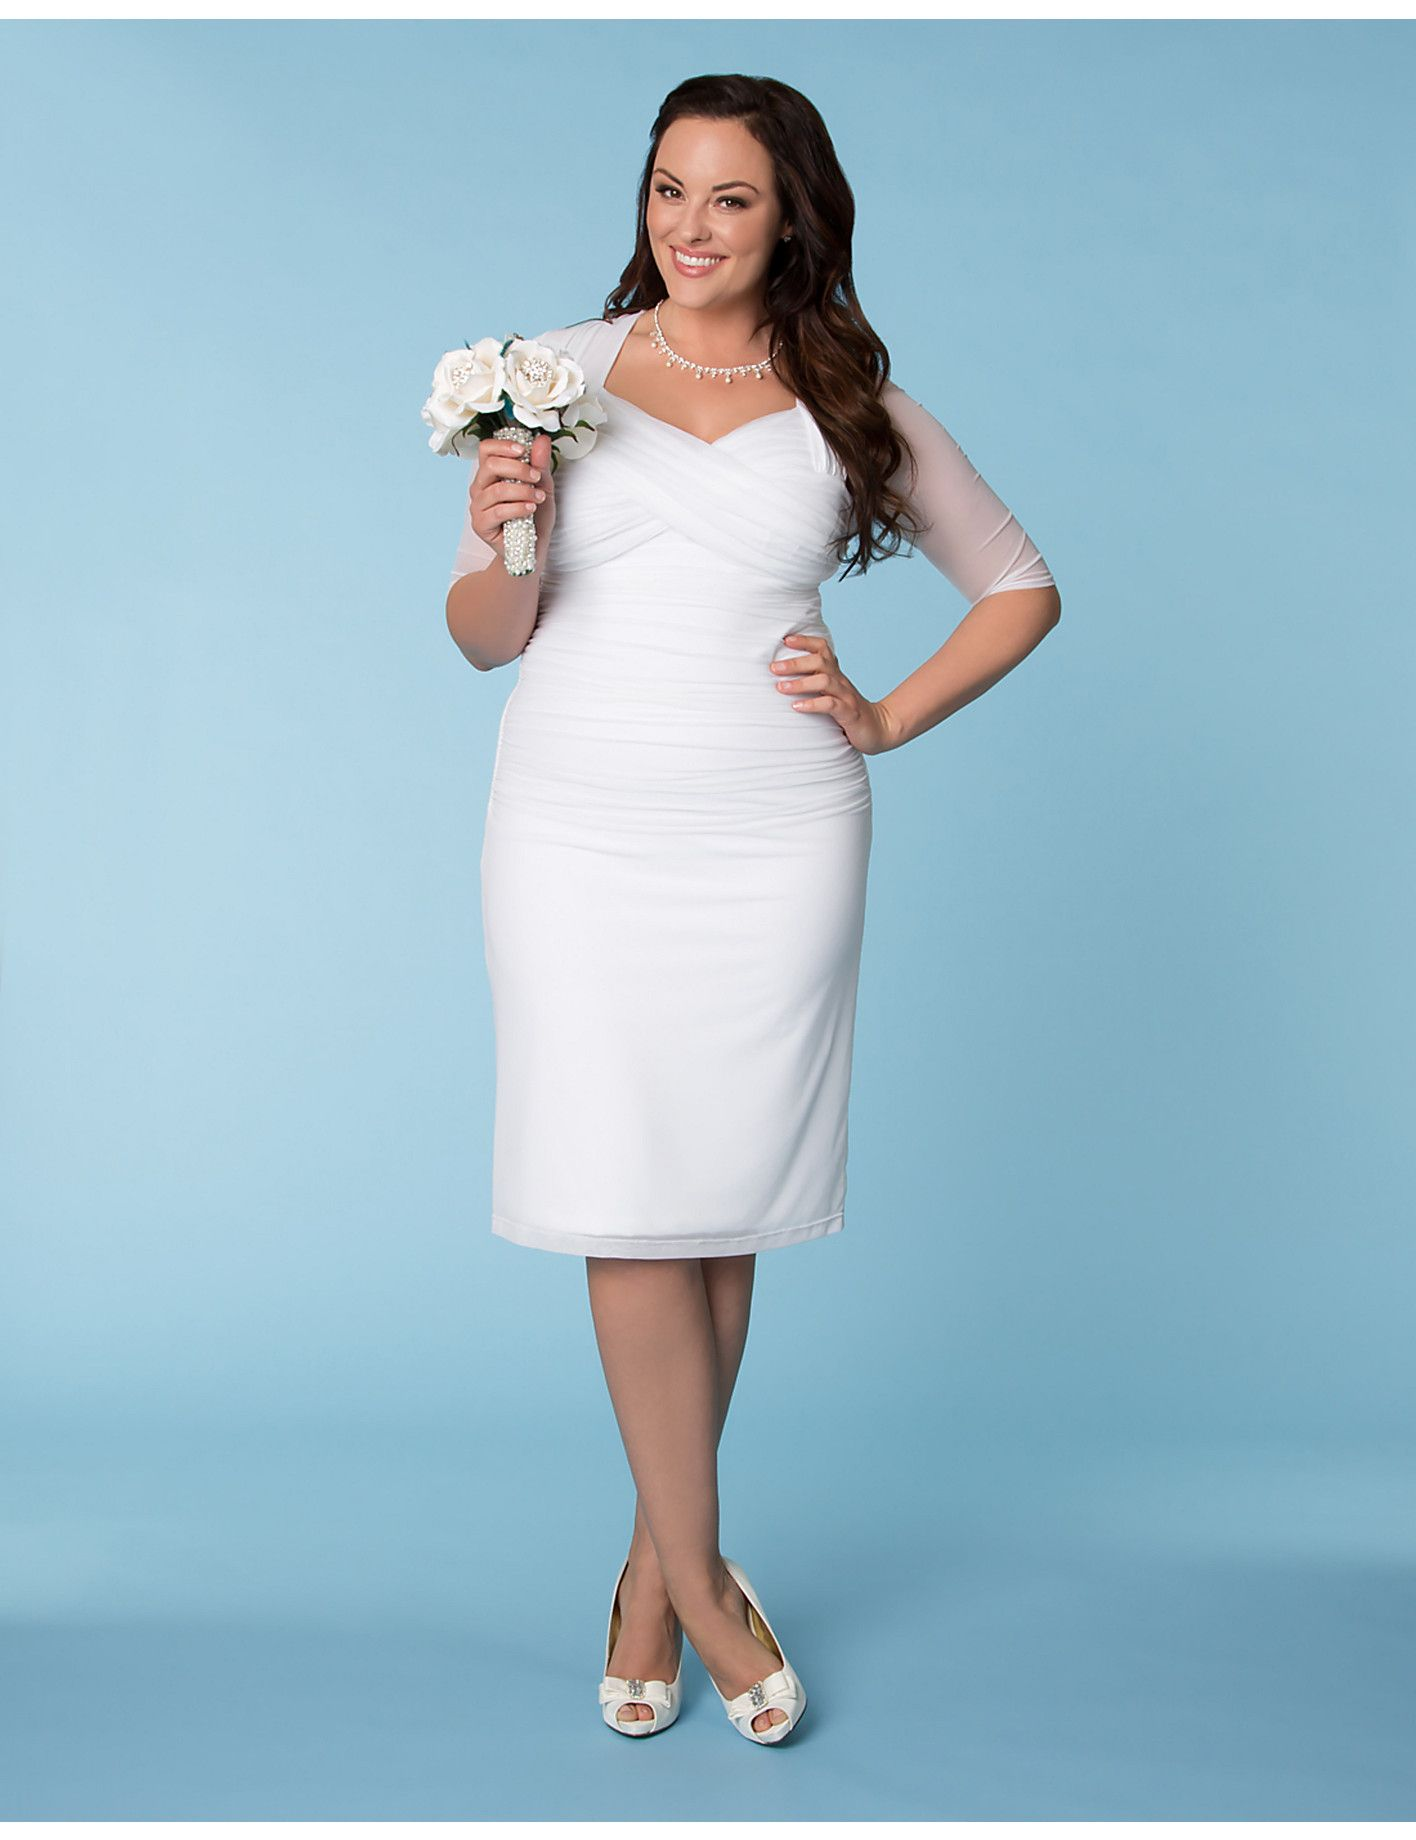 Raquel ruched wedding dress lane bryant third timeus a charm